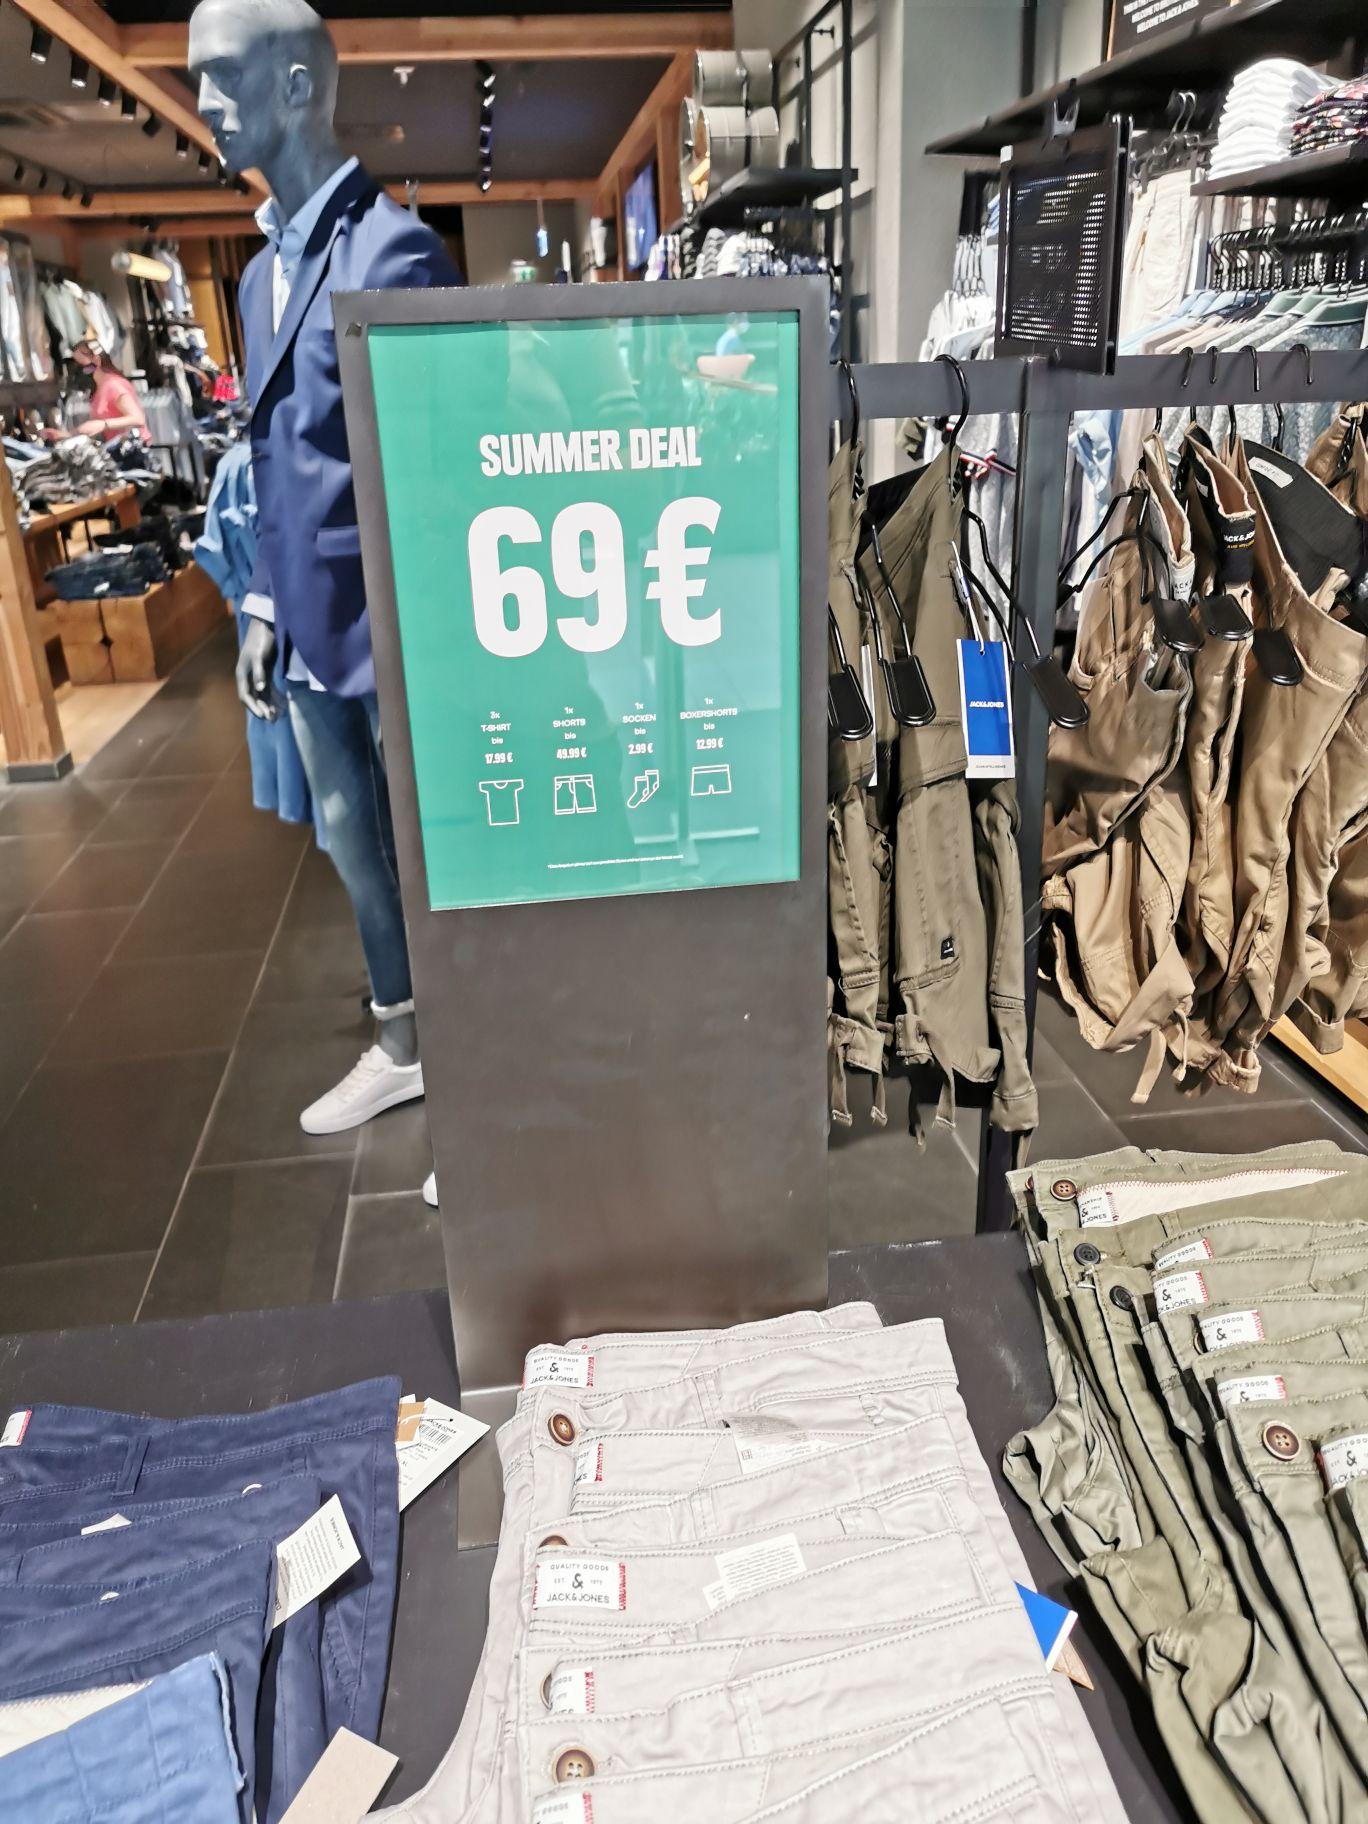 Sommeroutfit für 69€ bei JACK & JONES (lokal)